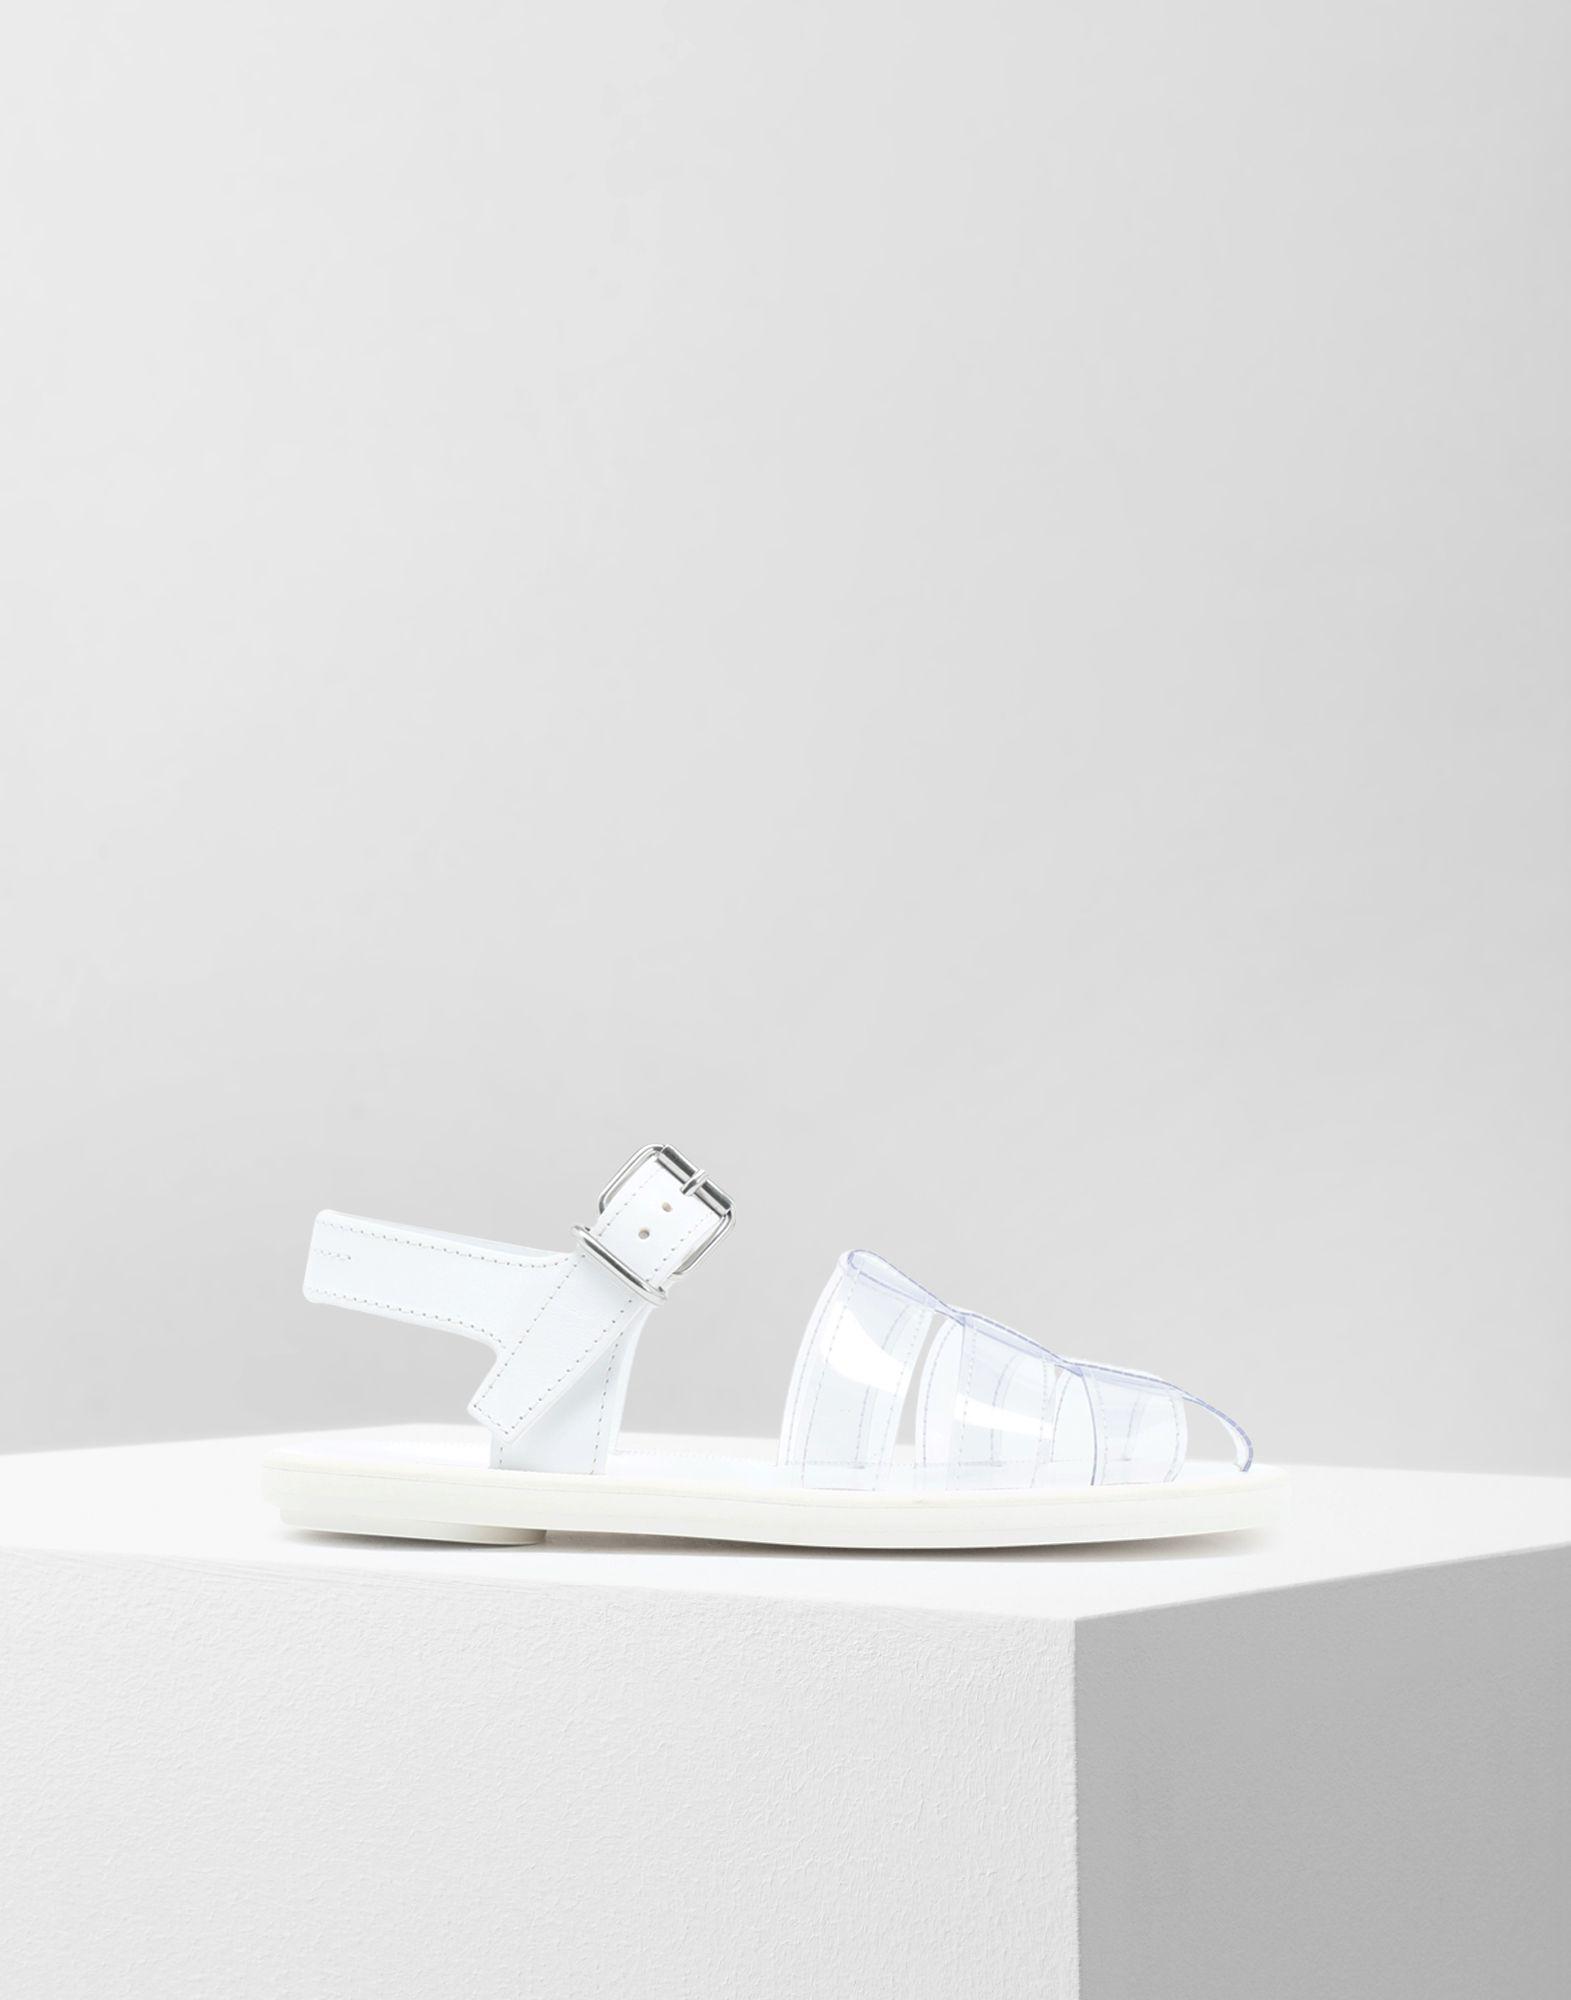 MM6 MAISON MARGIELA PVC pool slides Sandals Woman f